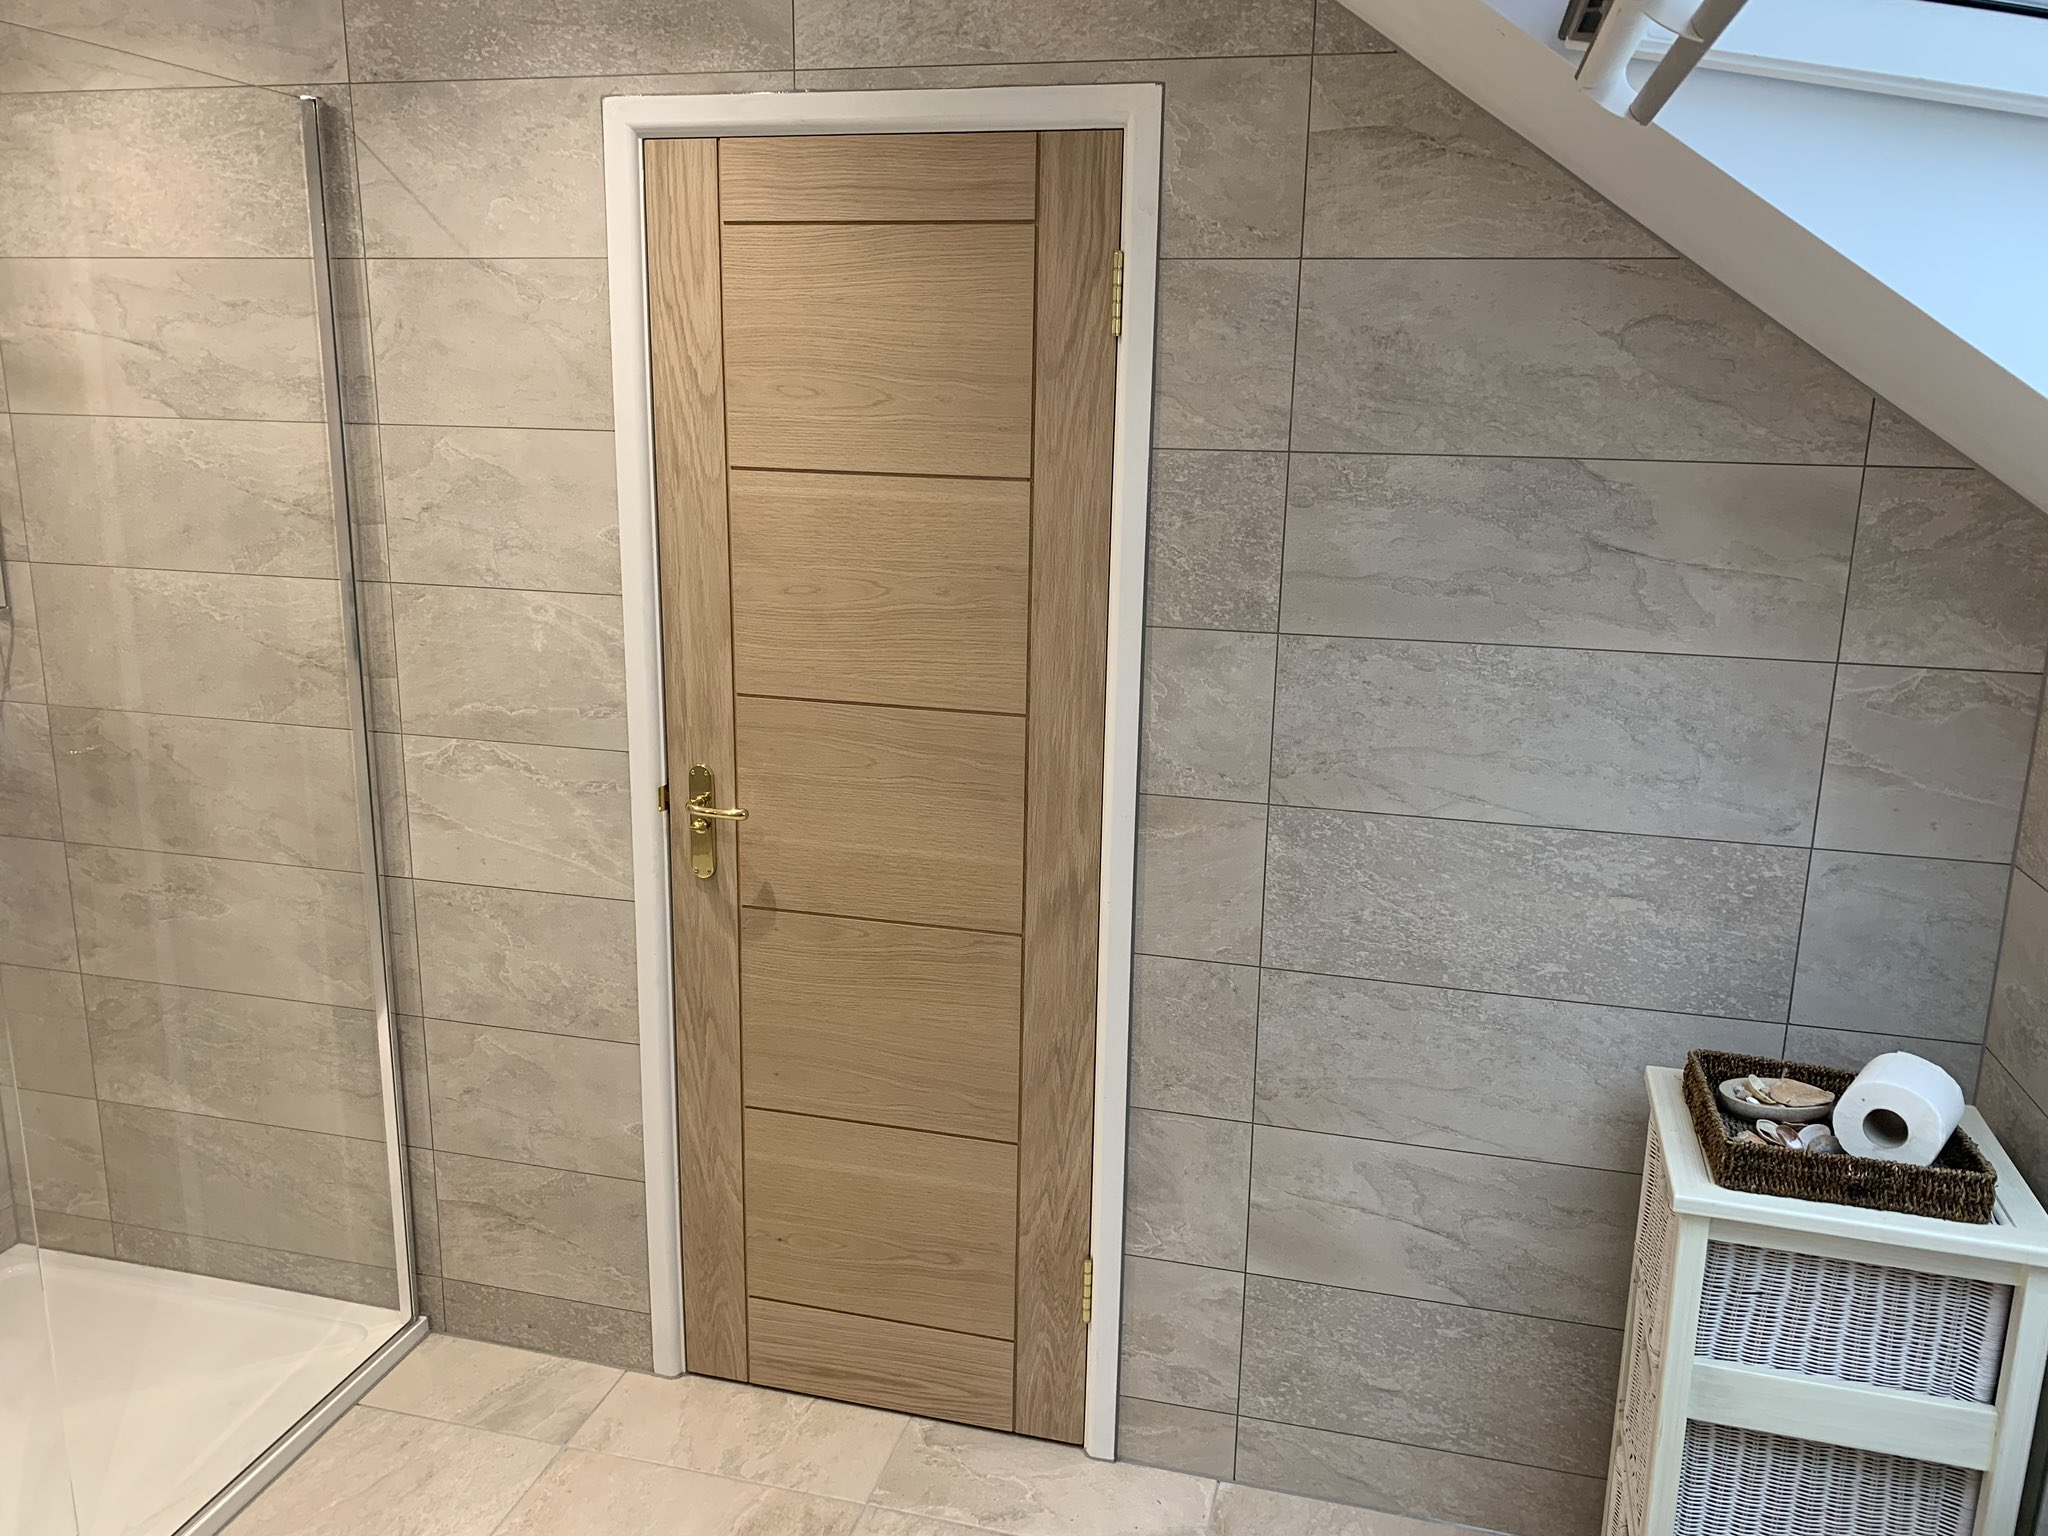 Bespoke Bathroom Door - Carpentry Services Poole